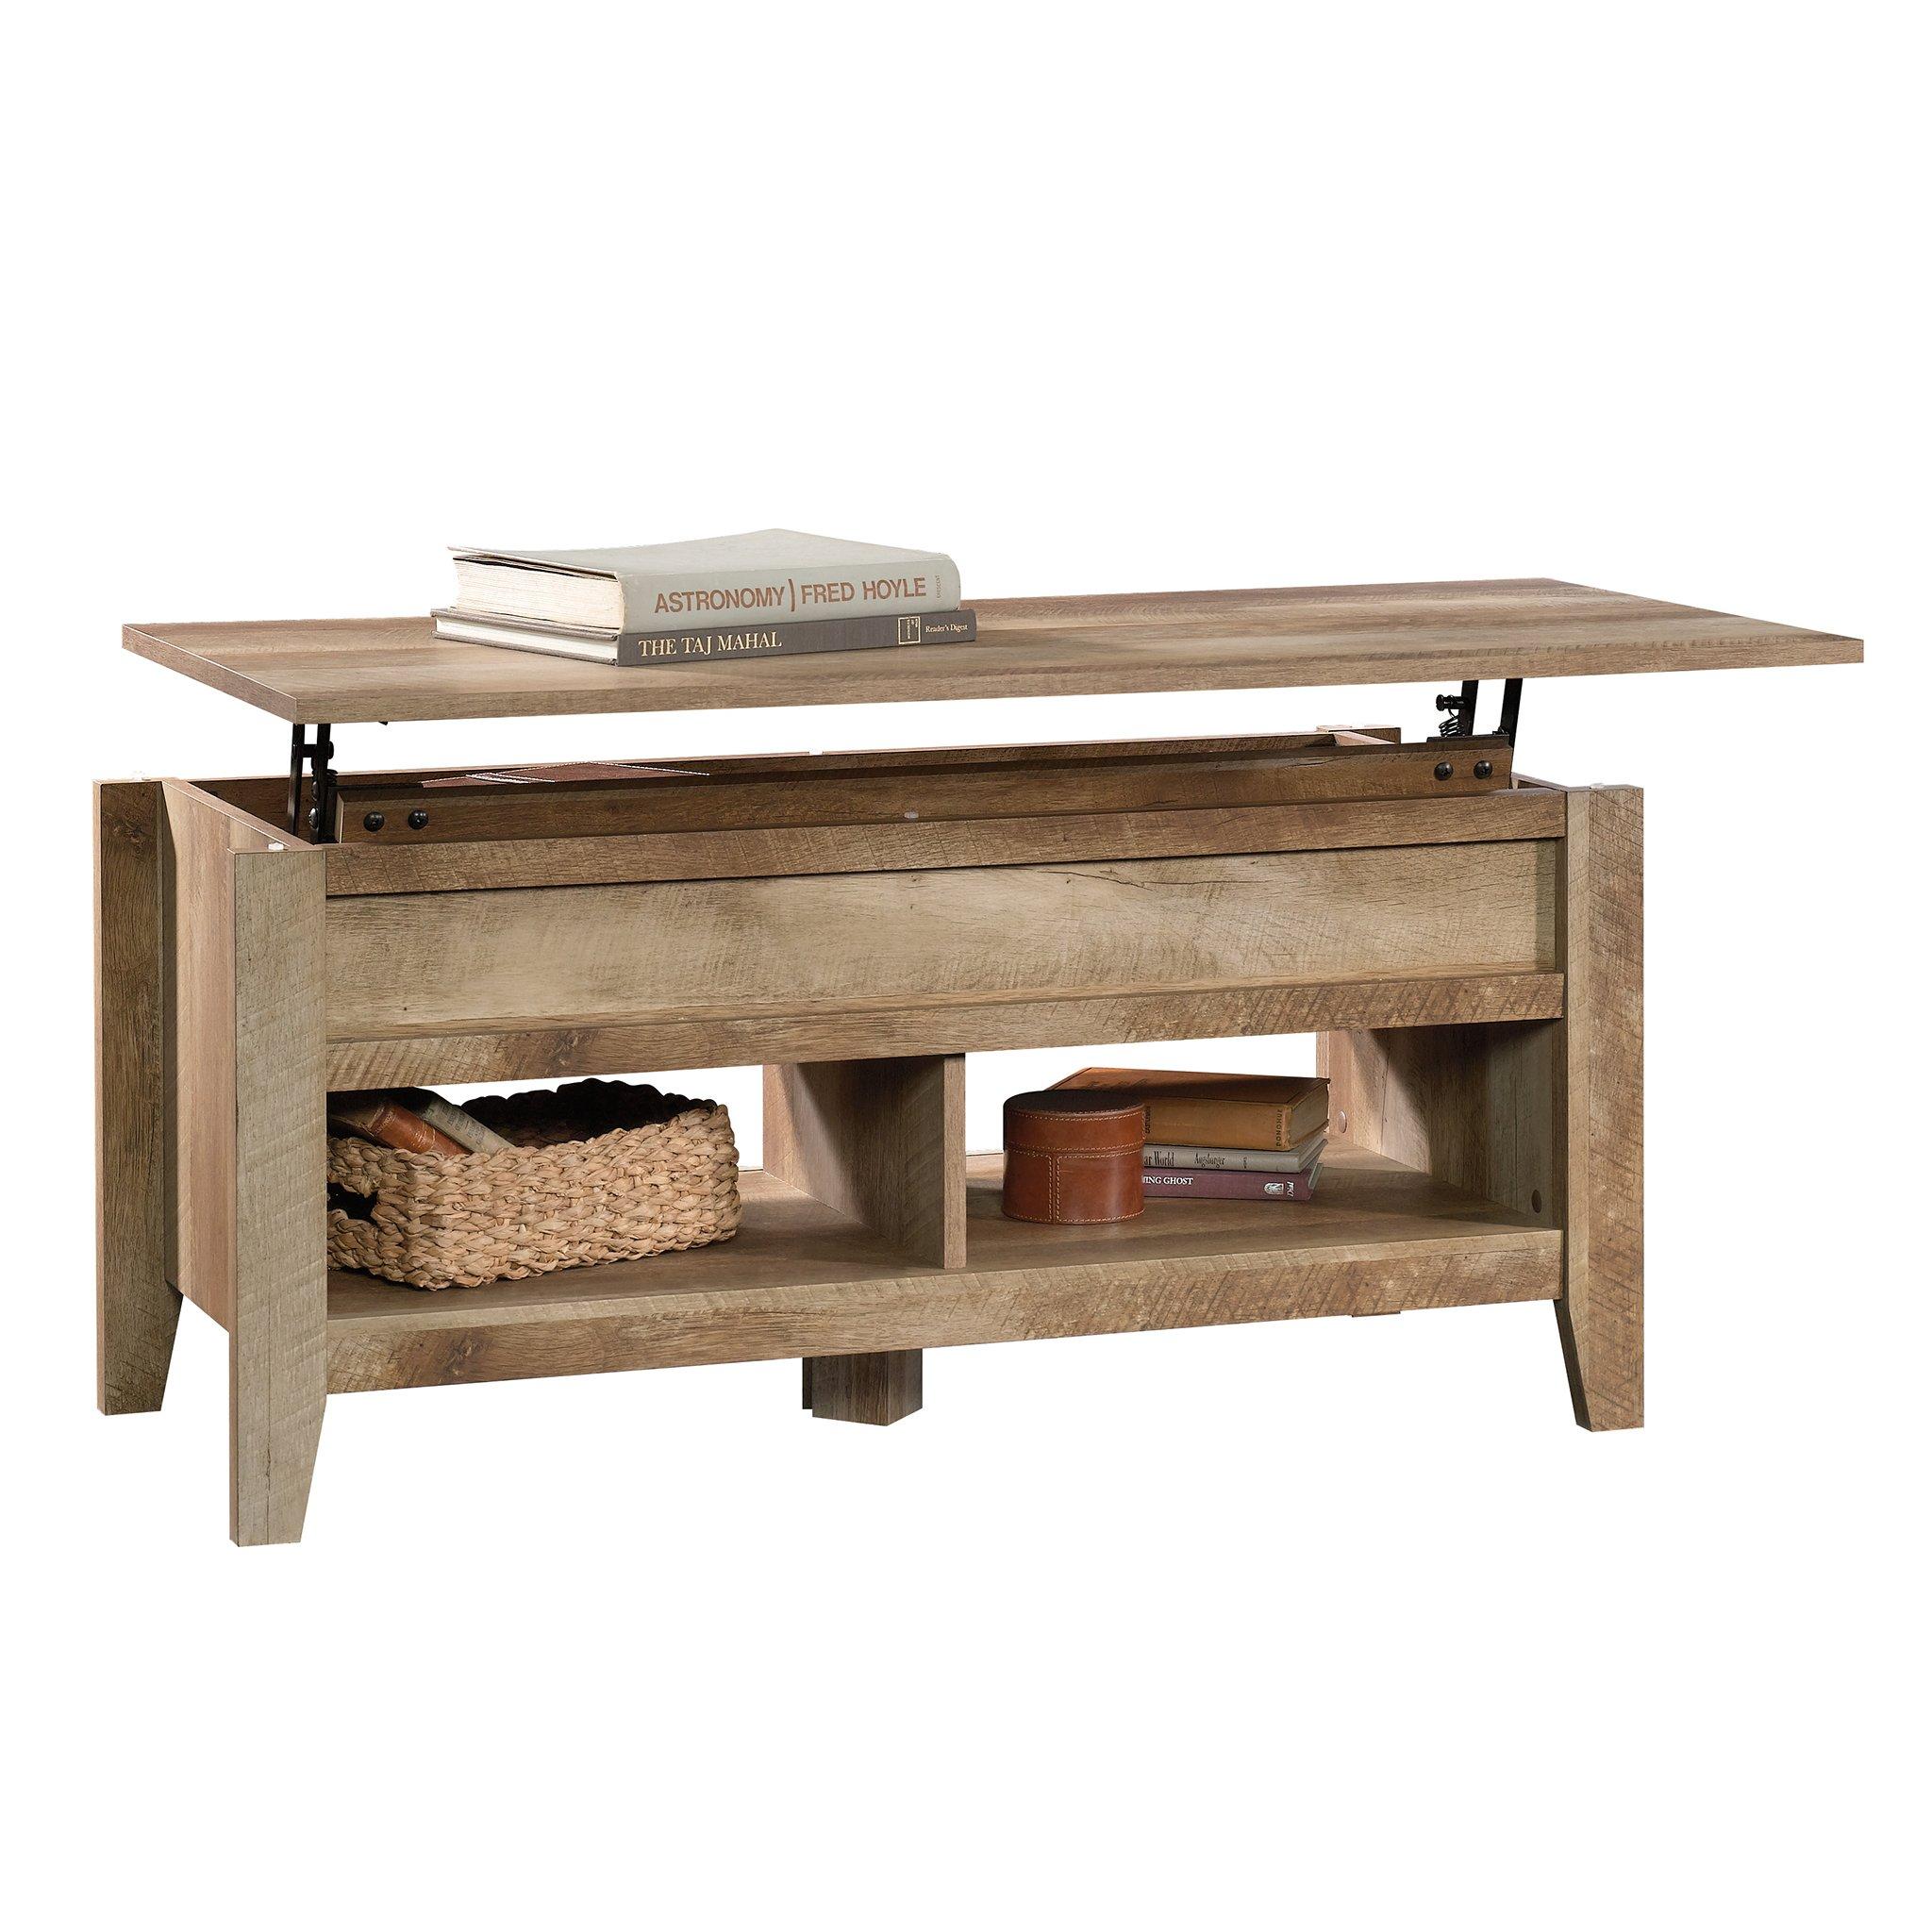 Sauder 420011 Coffee Table, Furniture, Craftsman Oak by Sauder